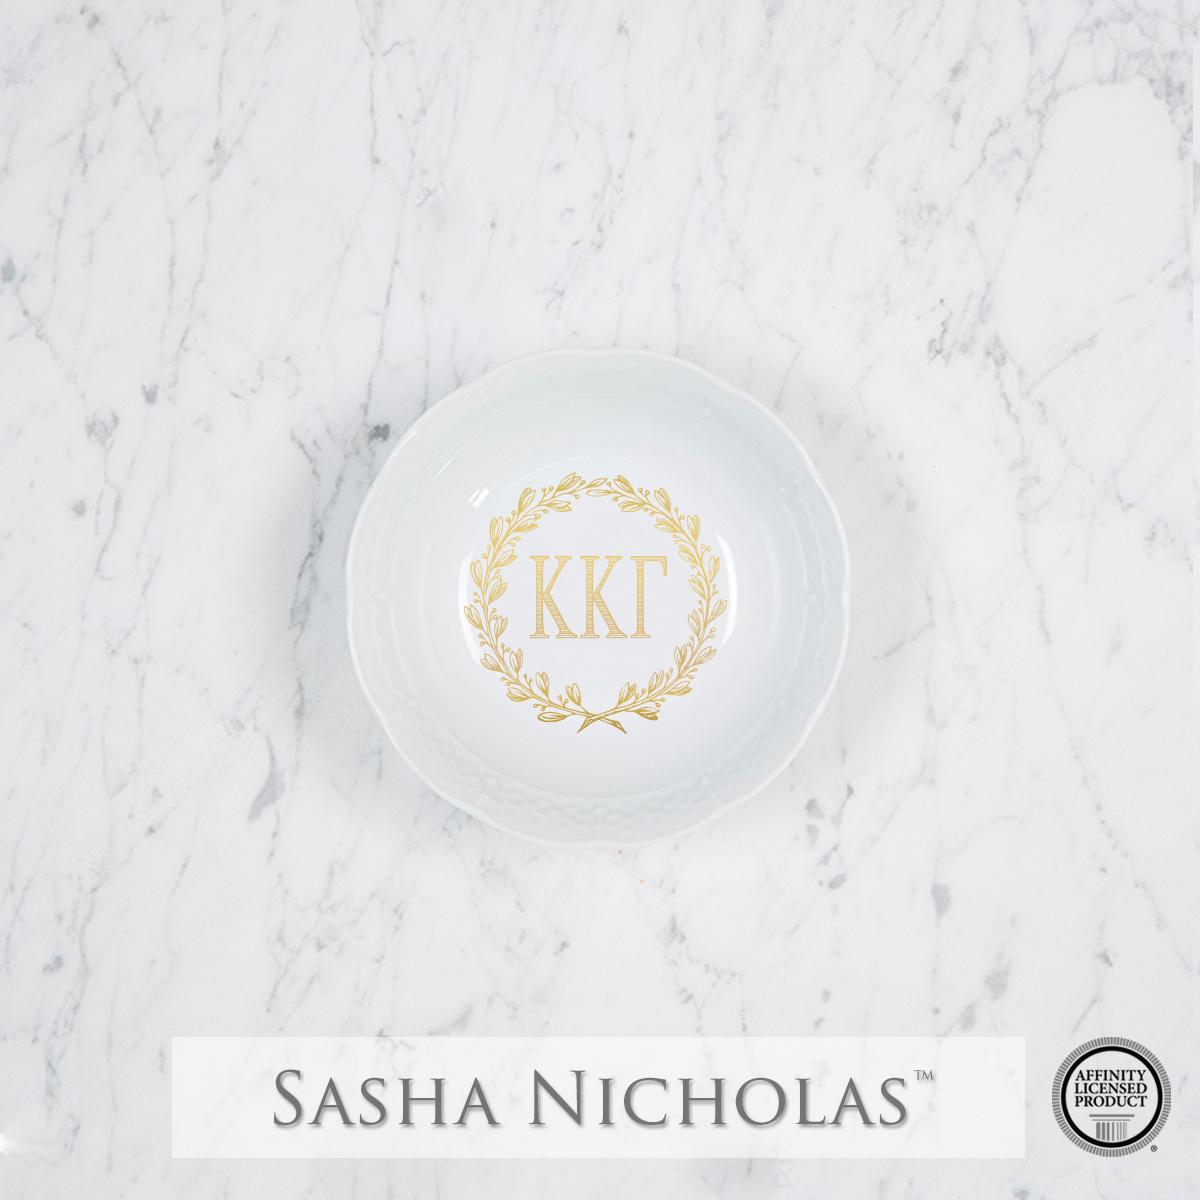 Kappa Kappa Gamma - Petite Bowl